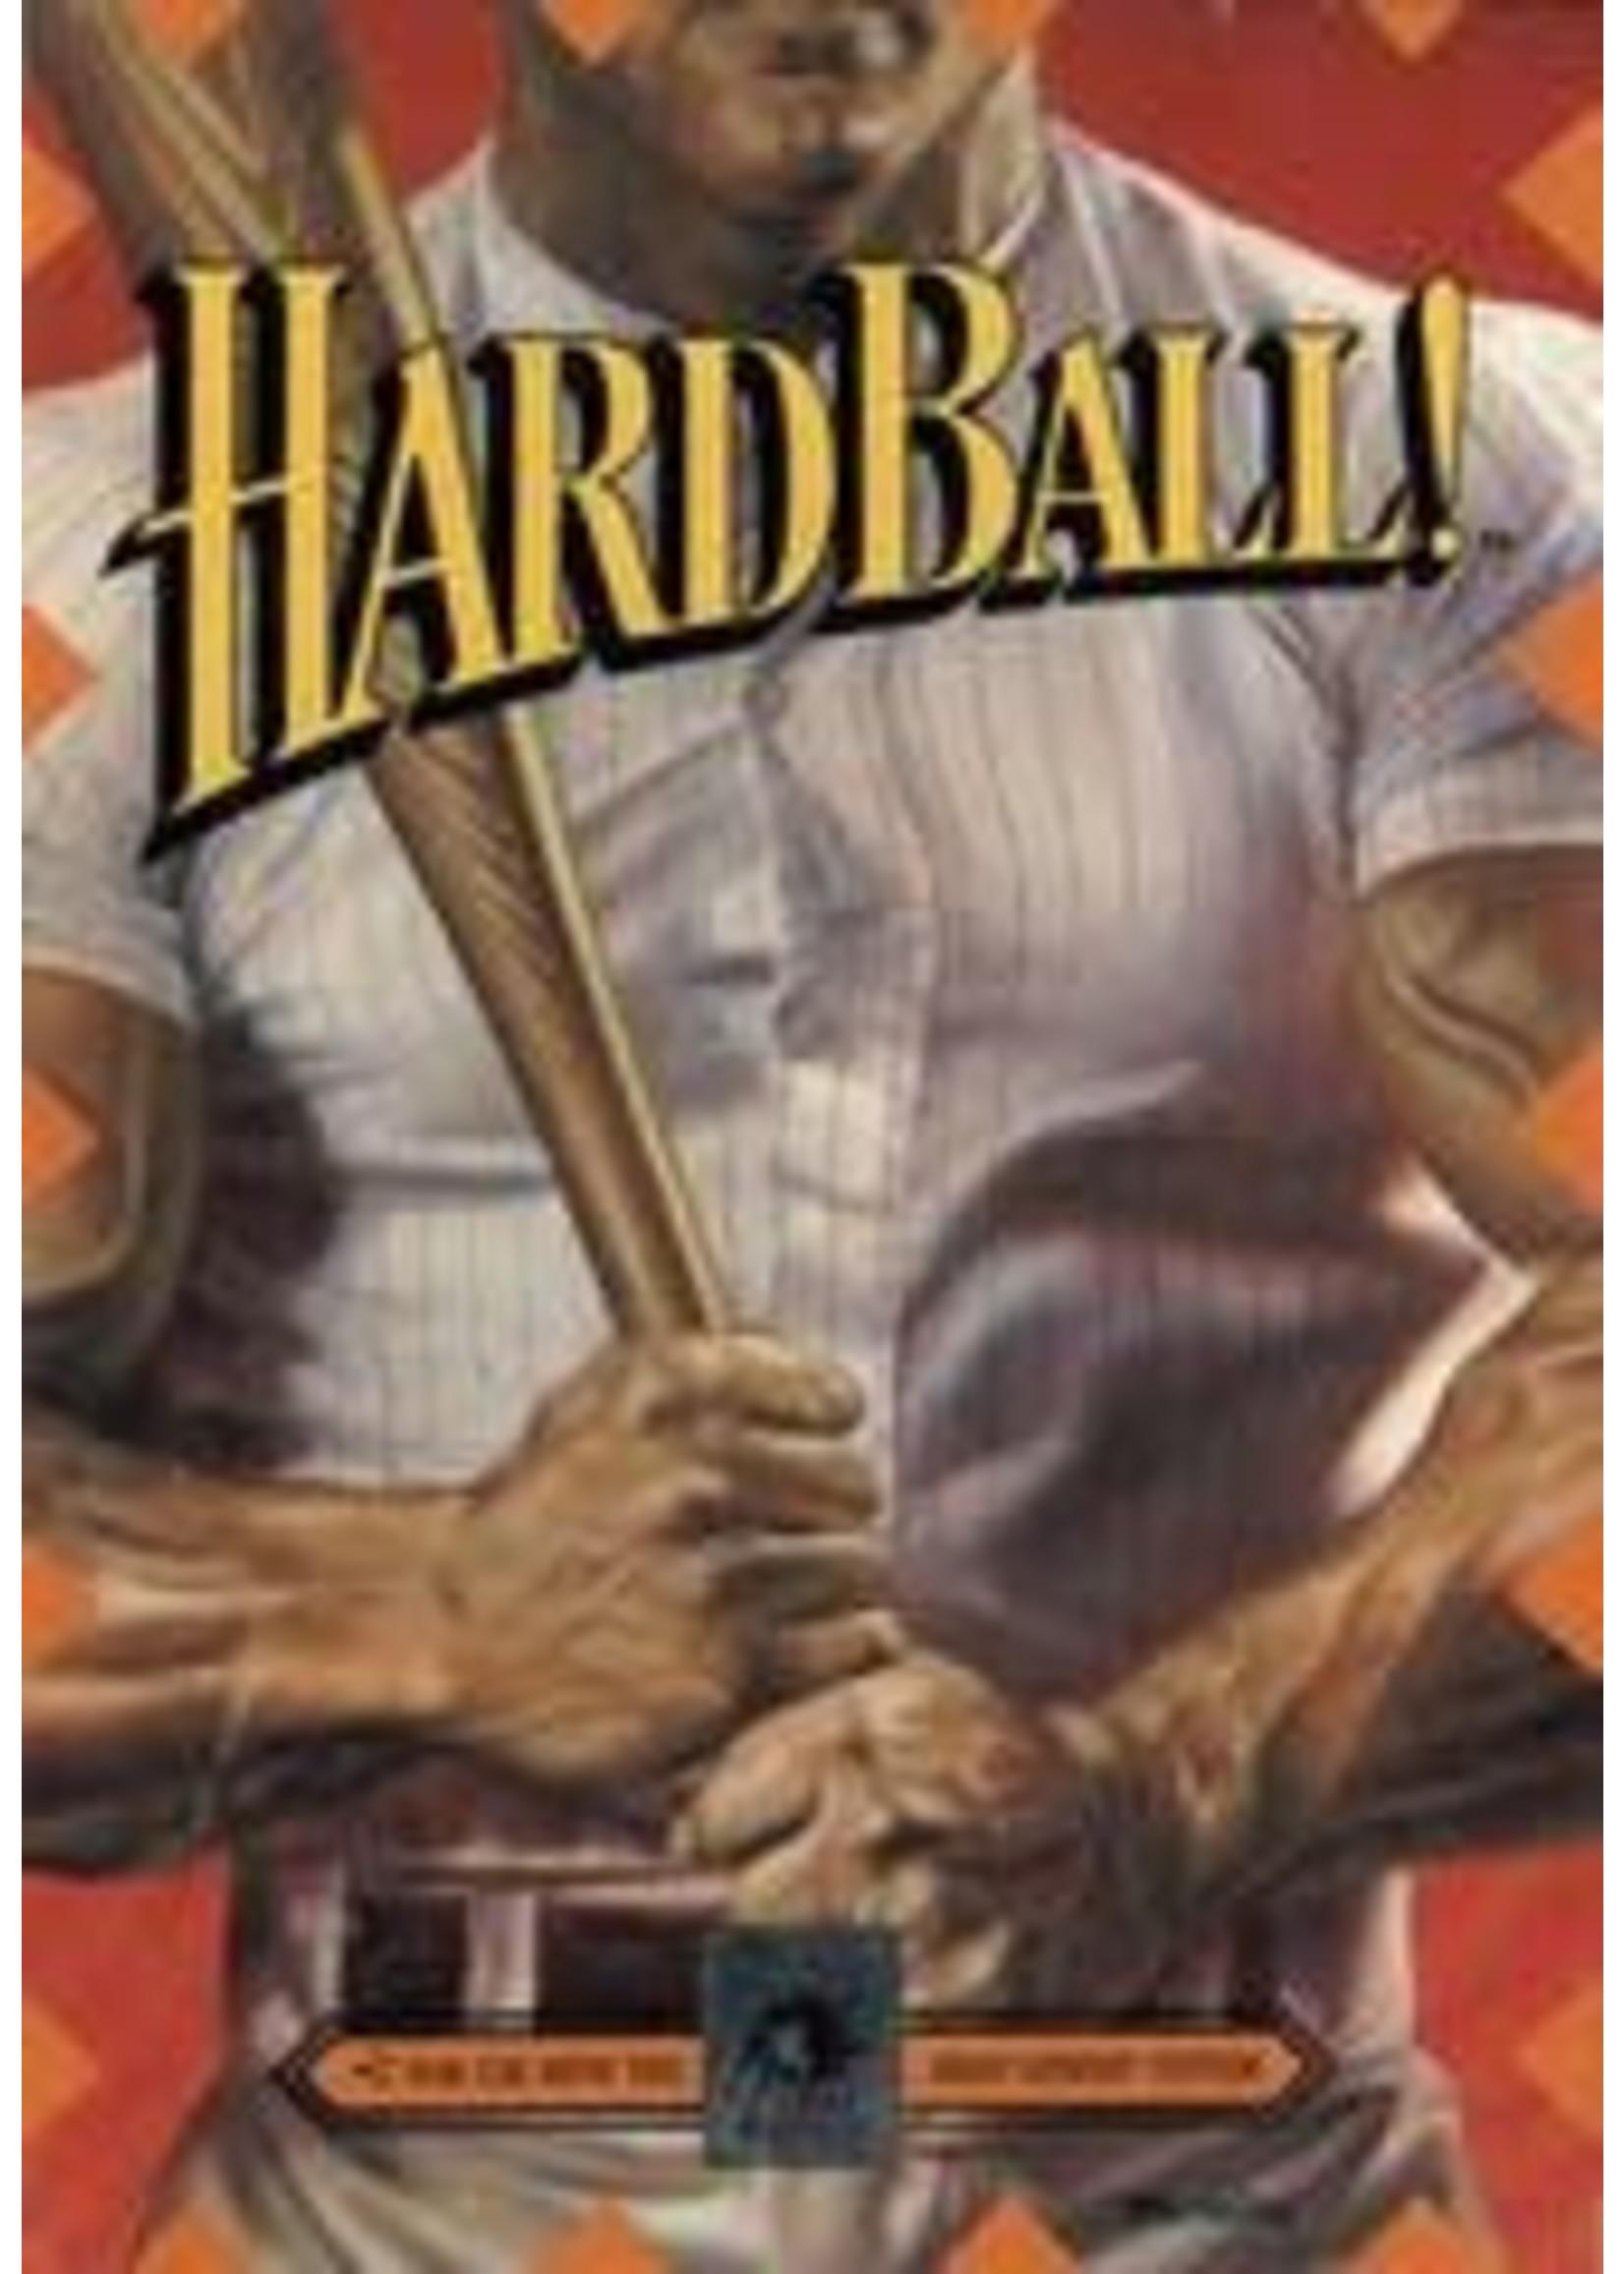 Hardball Sega Genesis